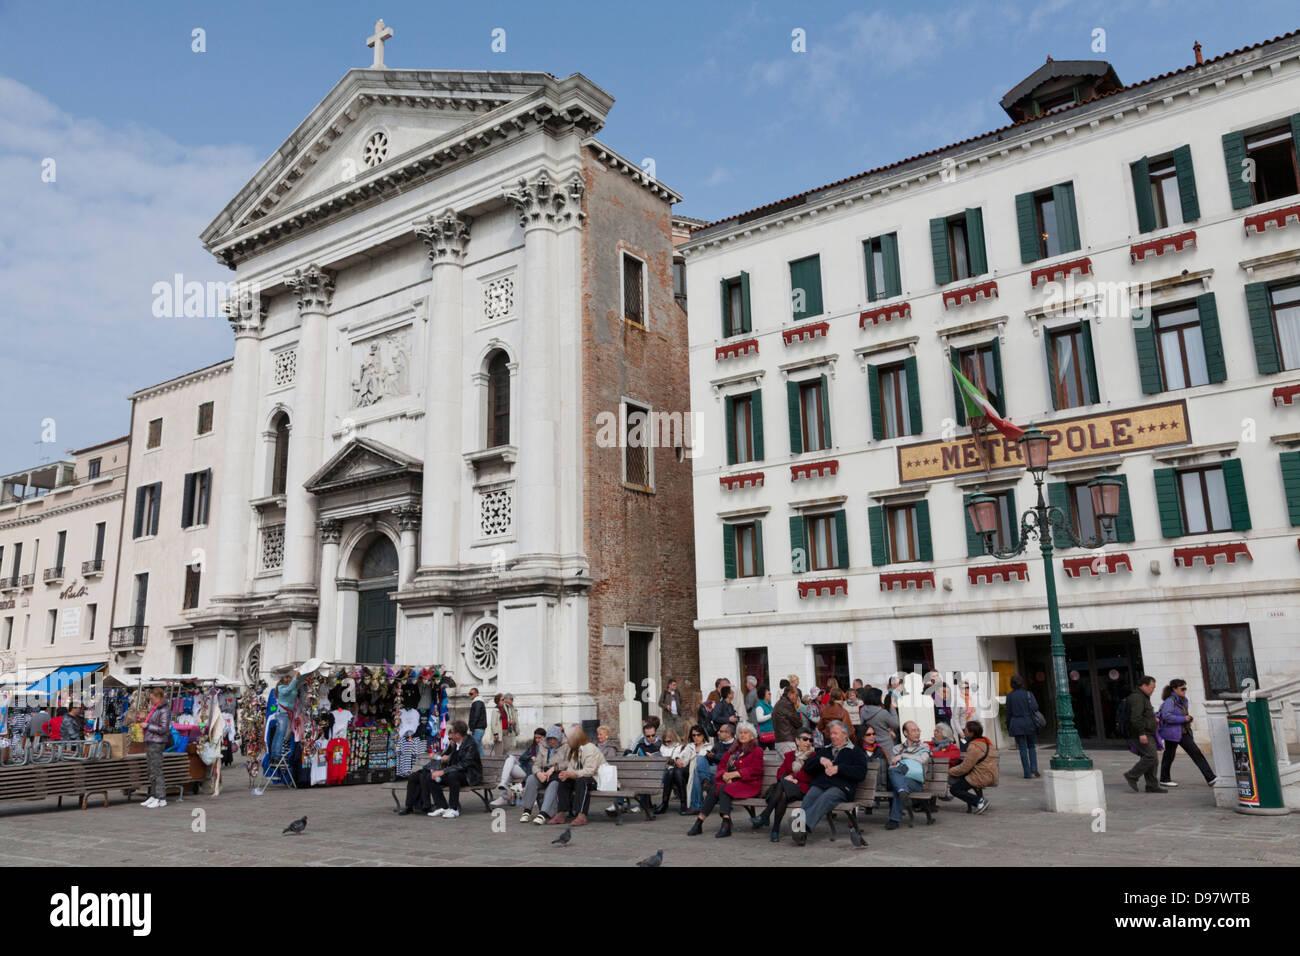 Hotel Metropole, Riva Degli Schiavoni, Venedig, Italien Stockbild